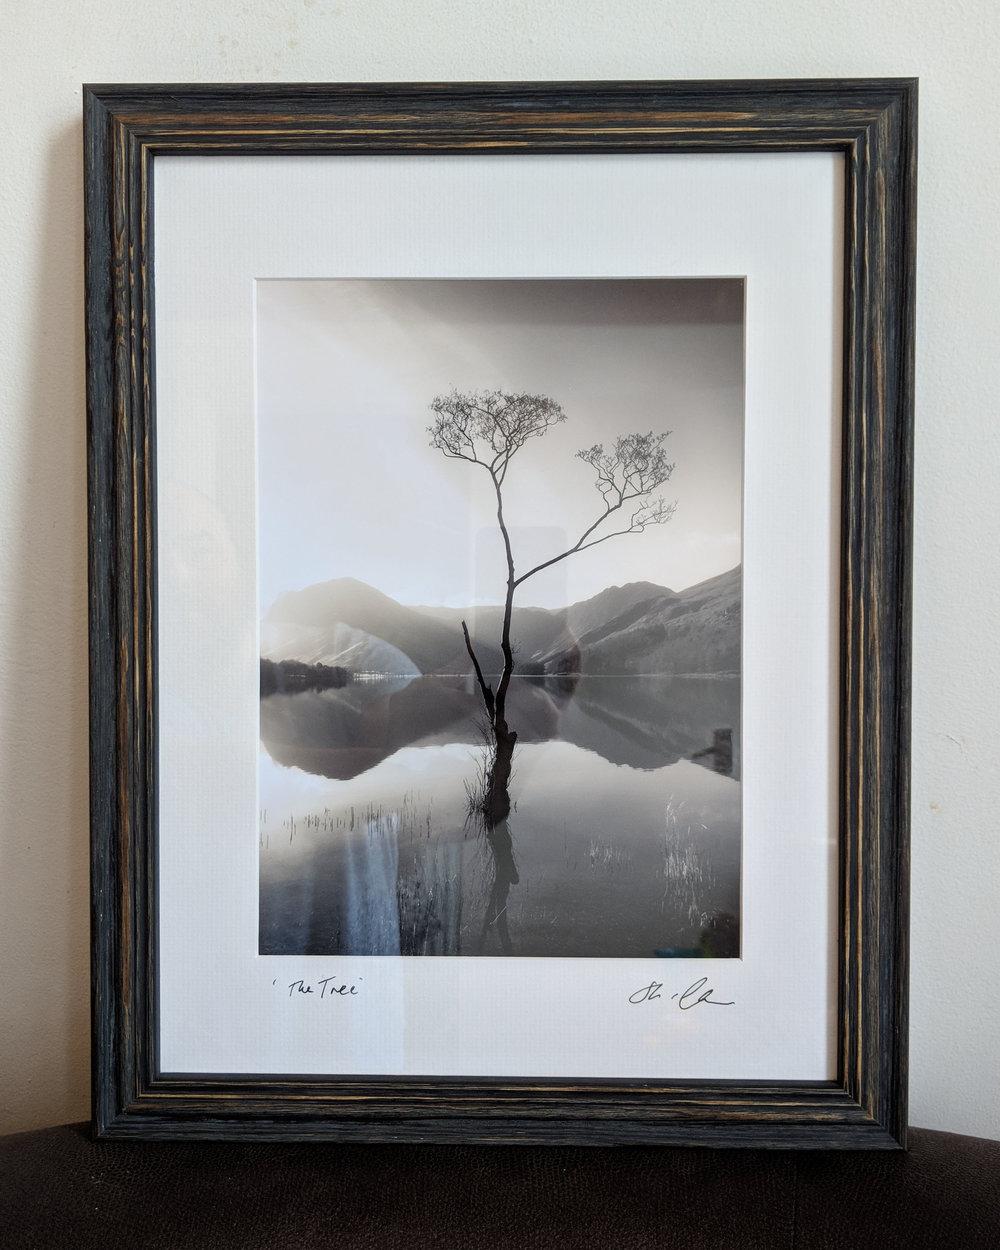 'The Tree' - framed in Distressed Oak